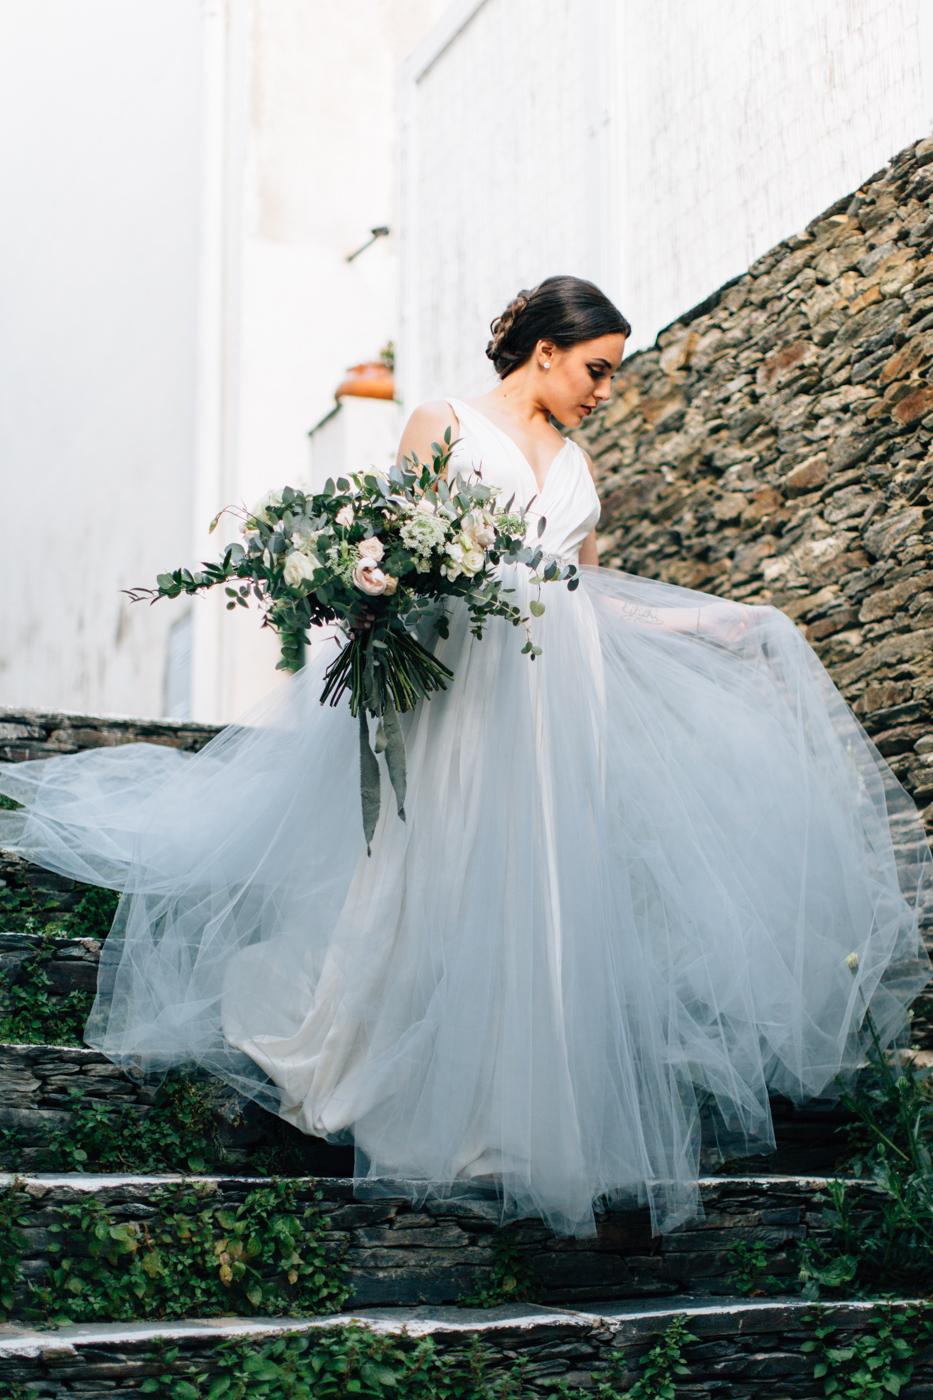 Four Corners Photography Best Atlanta Wedding Photographer Cadaques Elopement Photographer Best Atlanta Elopement Photographer Wedding in Spain Wedding in Cadaques Spain Lifestyle Photographer